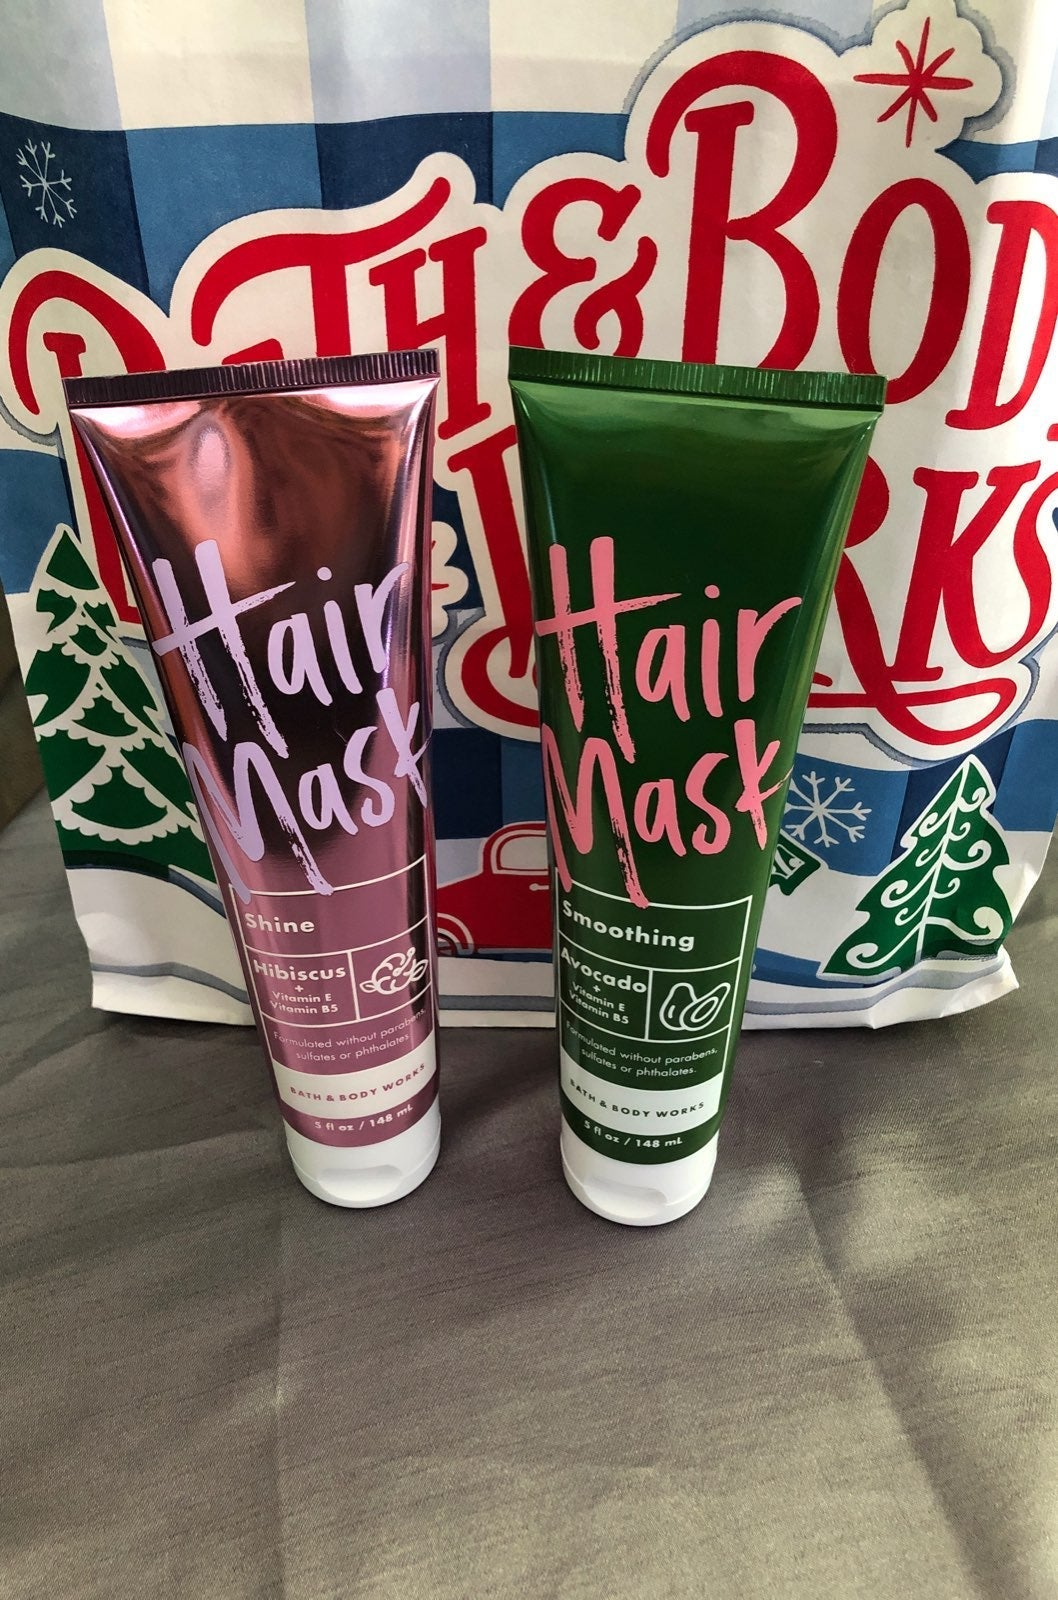 Bbw hair masks (2)